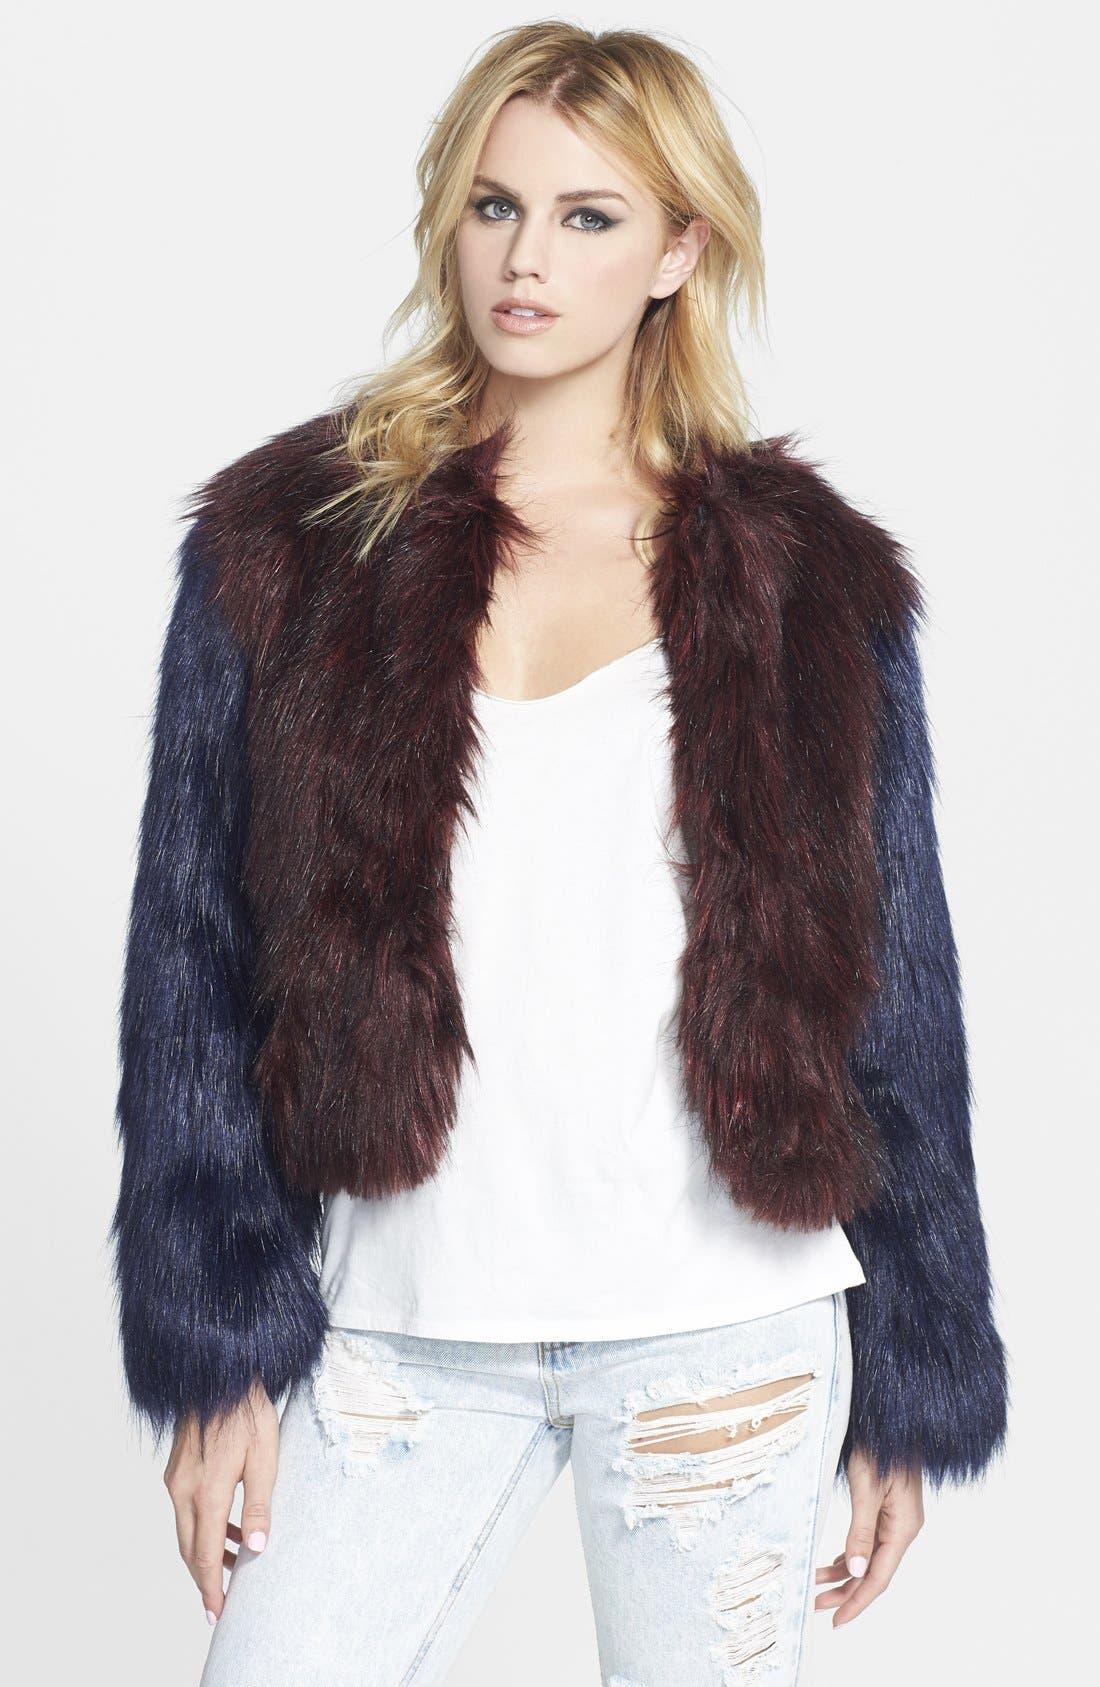 Alternate Image 1 Selected - Glamorous Two Tone Faux Fur Jacket